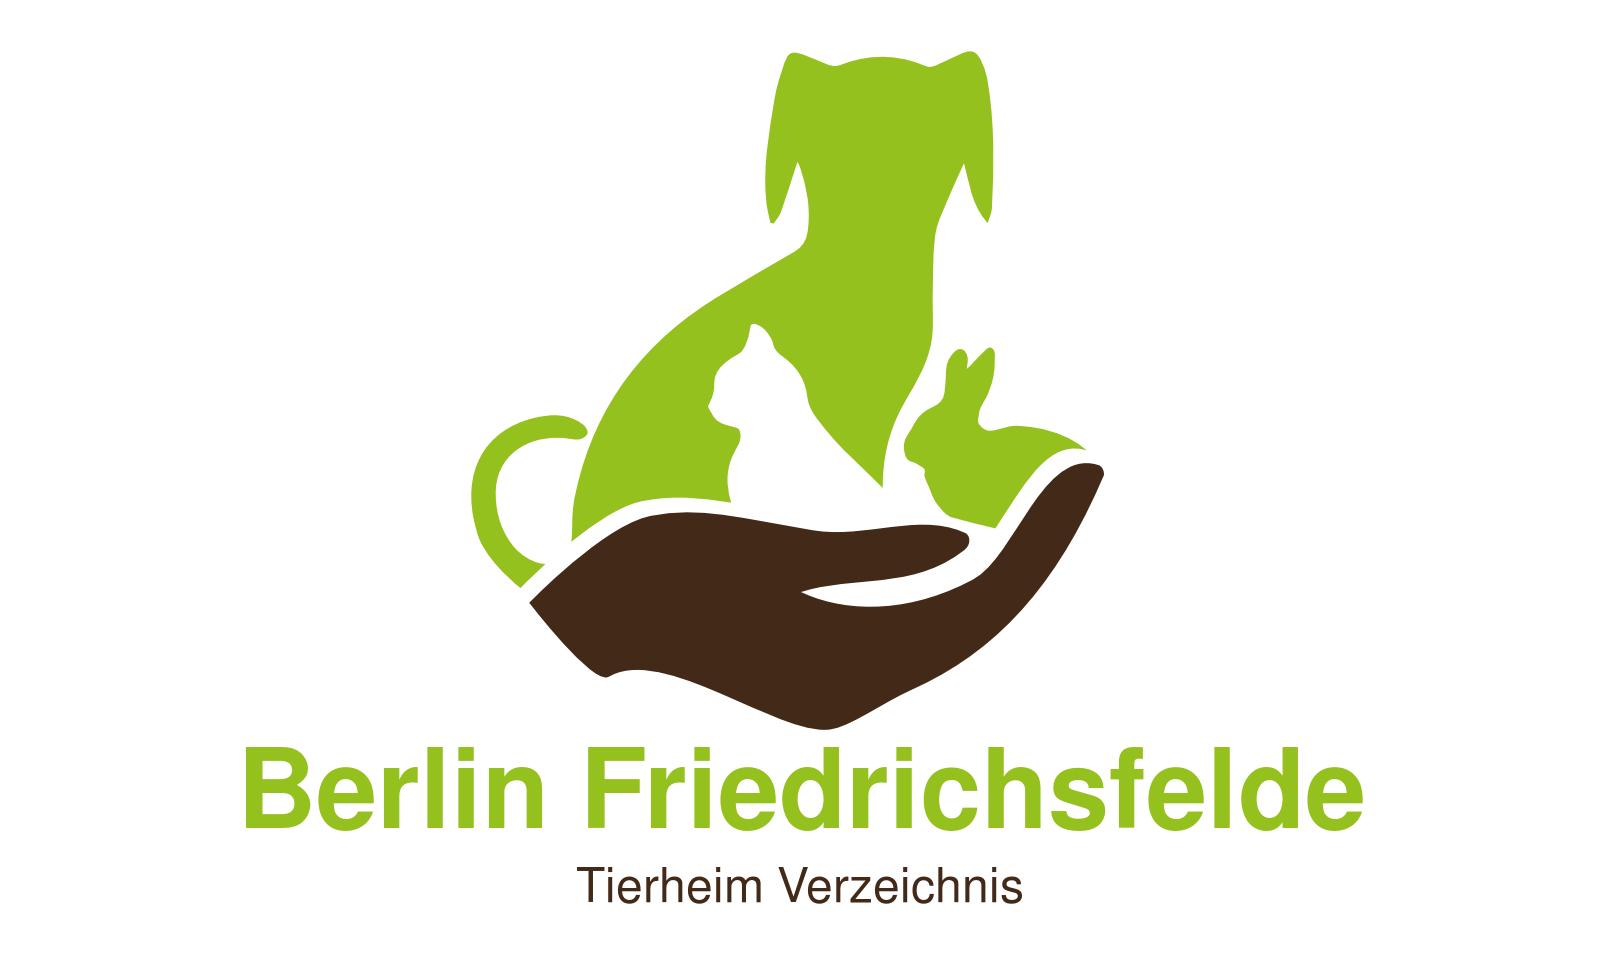 Tierheim Berlin Friedrichsfelde